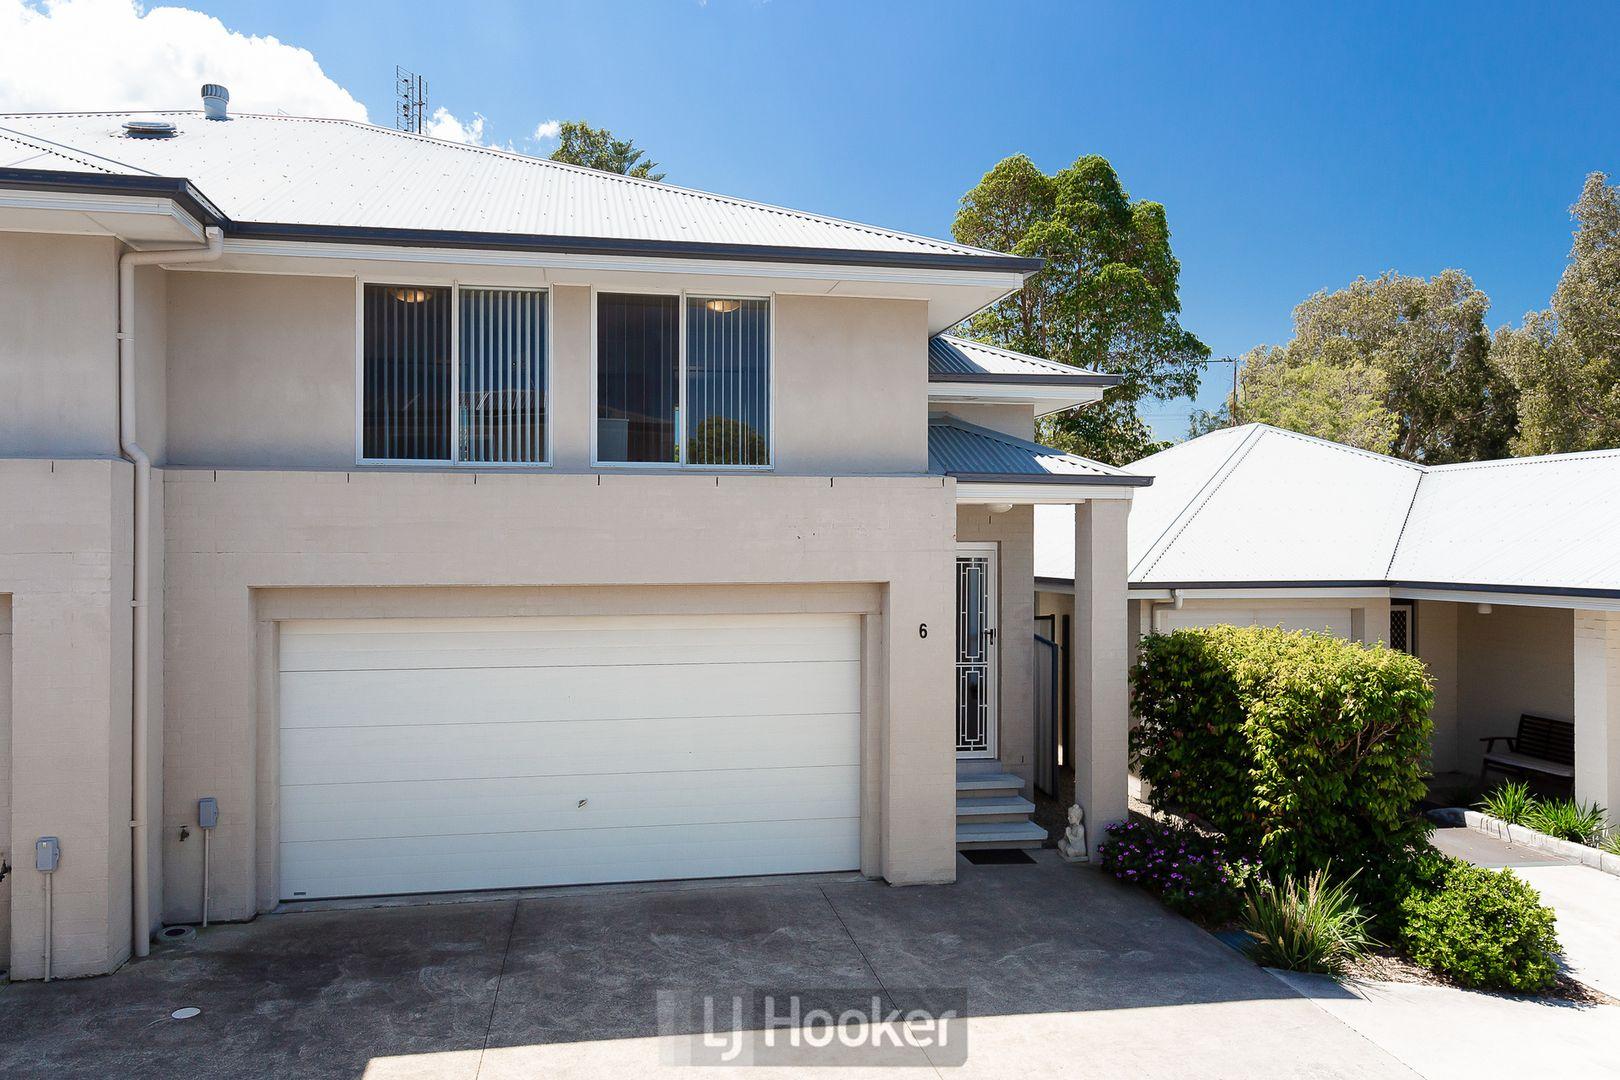 6/30 Helen Street, Mount Hutton NSW 2290, Image 0